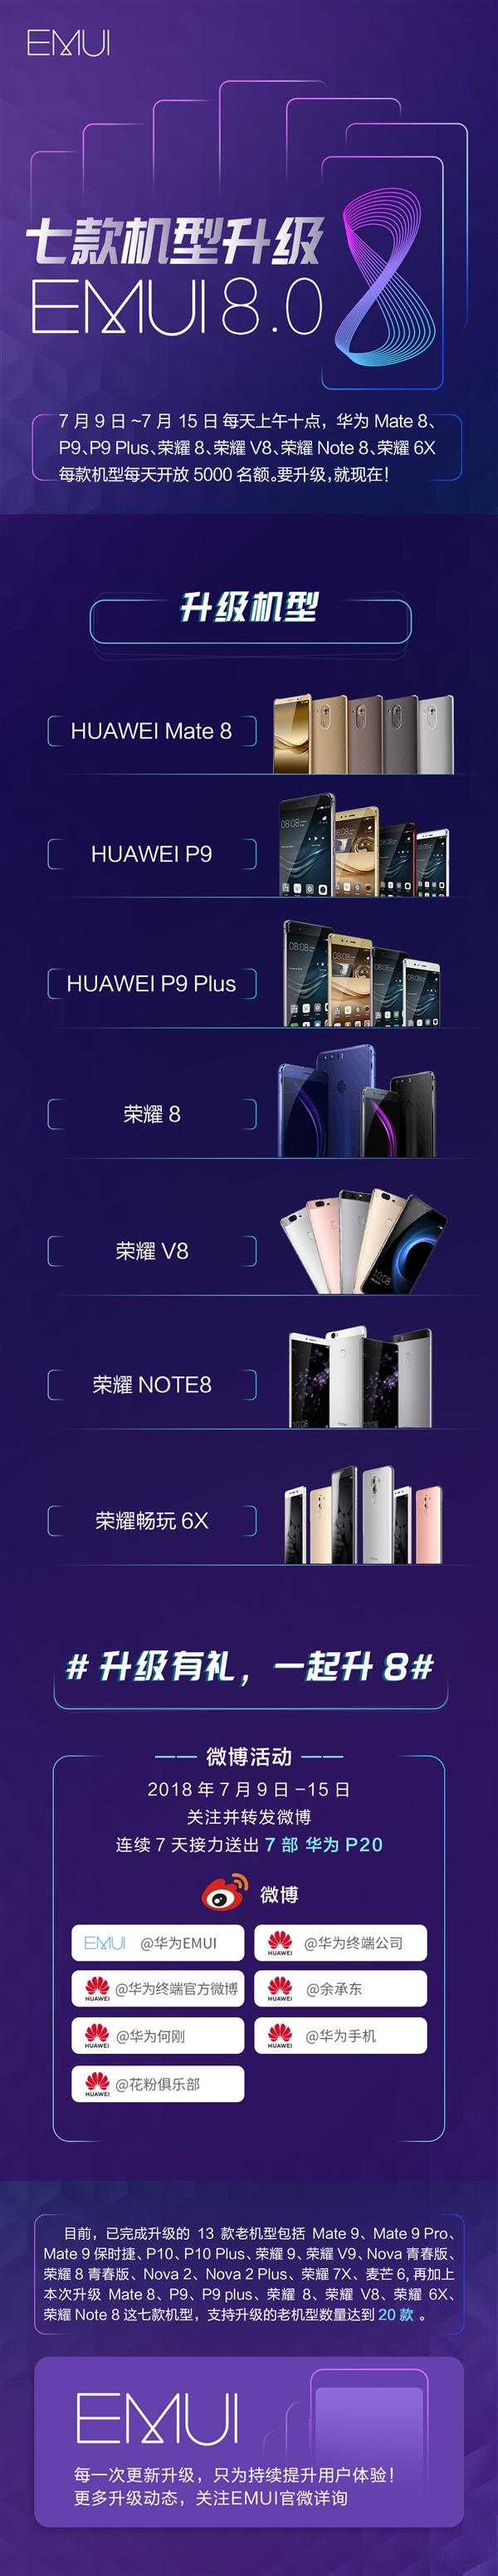 Huawei EMUI 8 upgrade